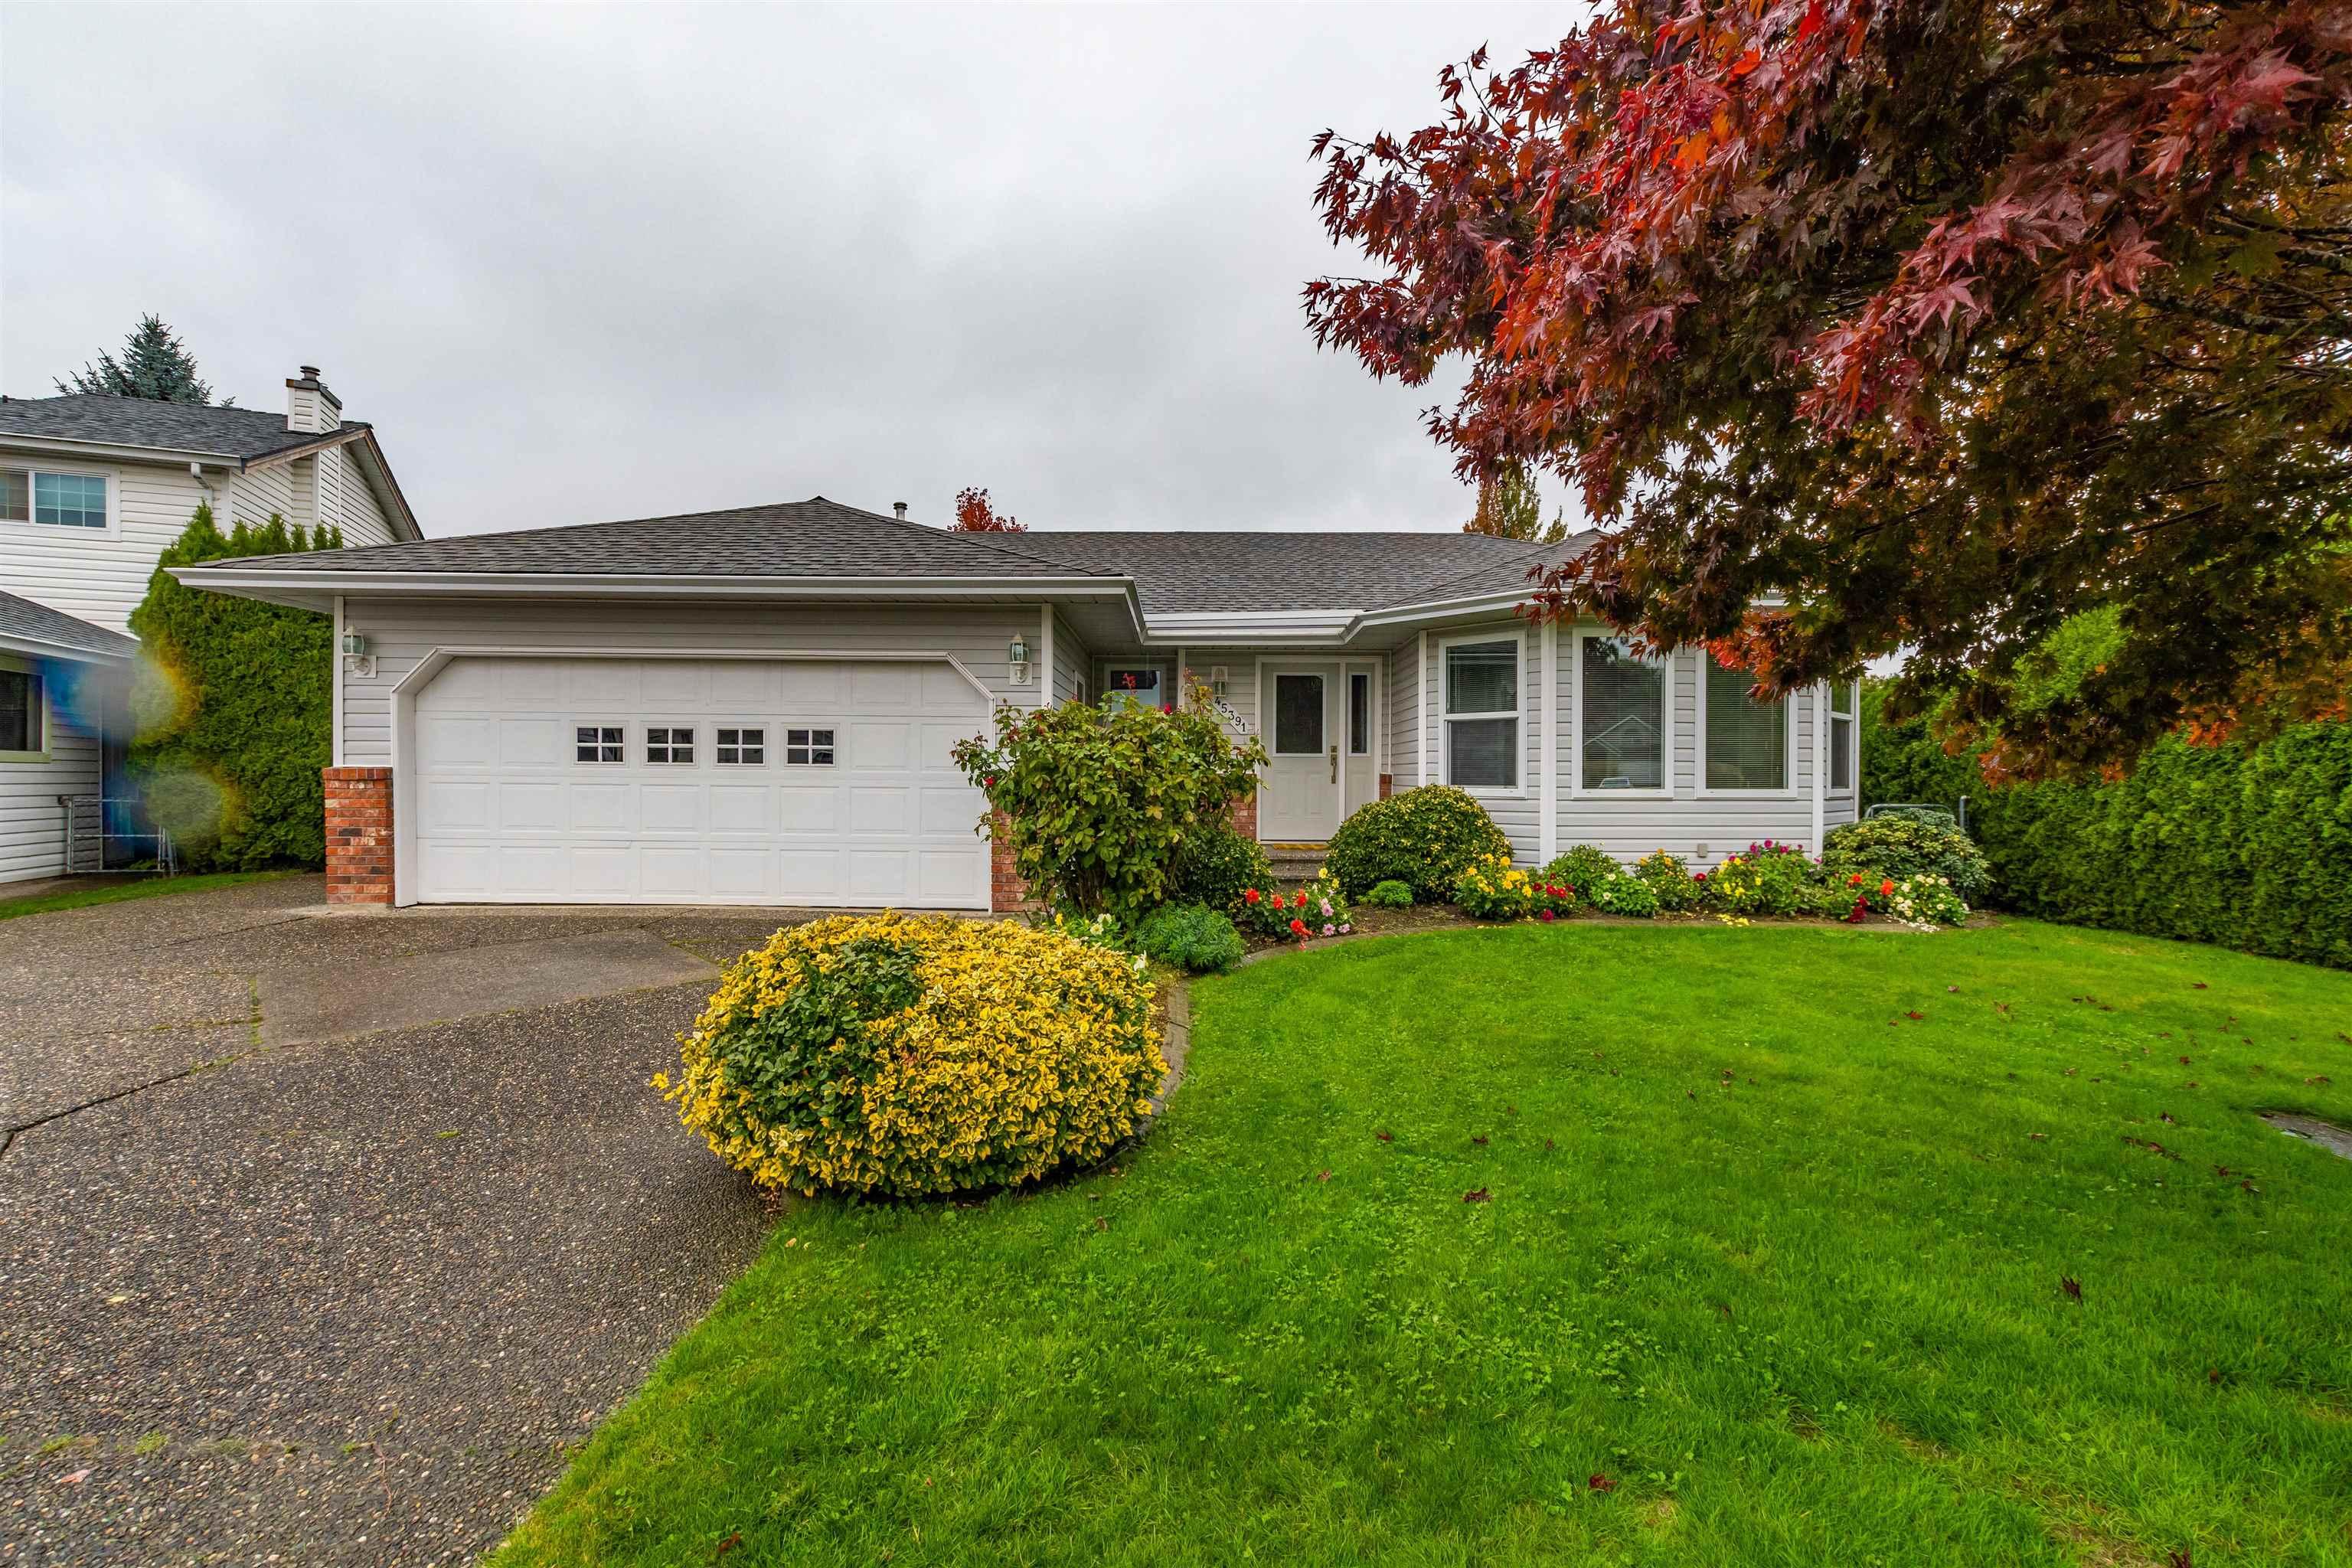 45391 JASPER DRIVE - Sardis West Vedder Rd House/Single Family for sale, 3 Bedrooms (R2626733) - #1